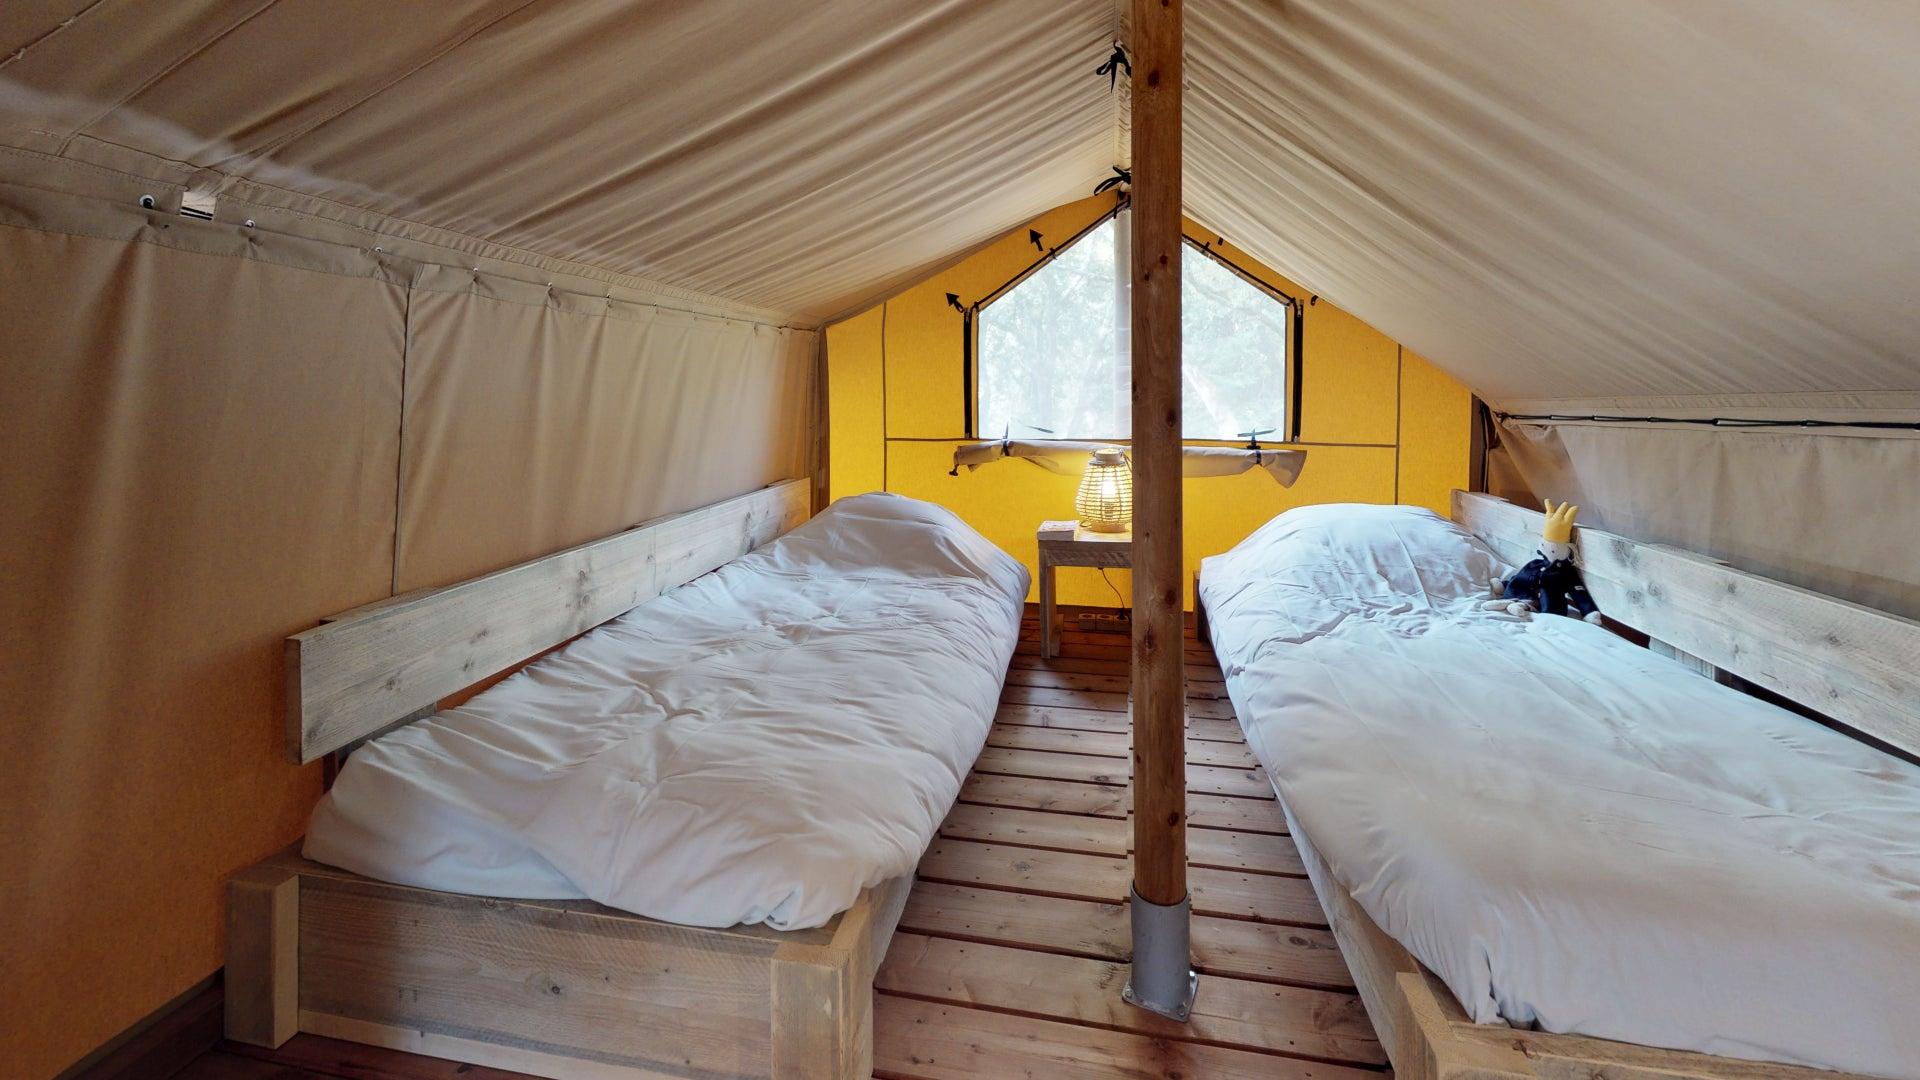 Domaine de Bélézy- Tente Safari Tribu 8-9 Pers